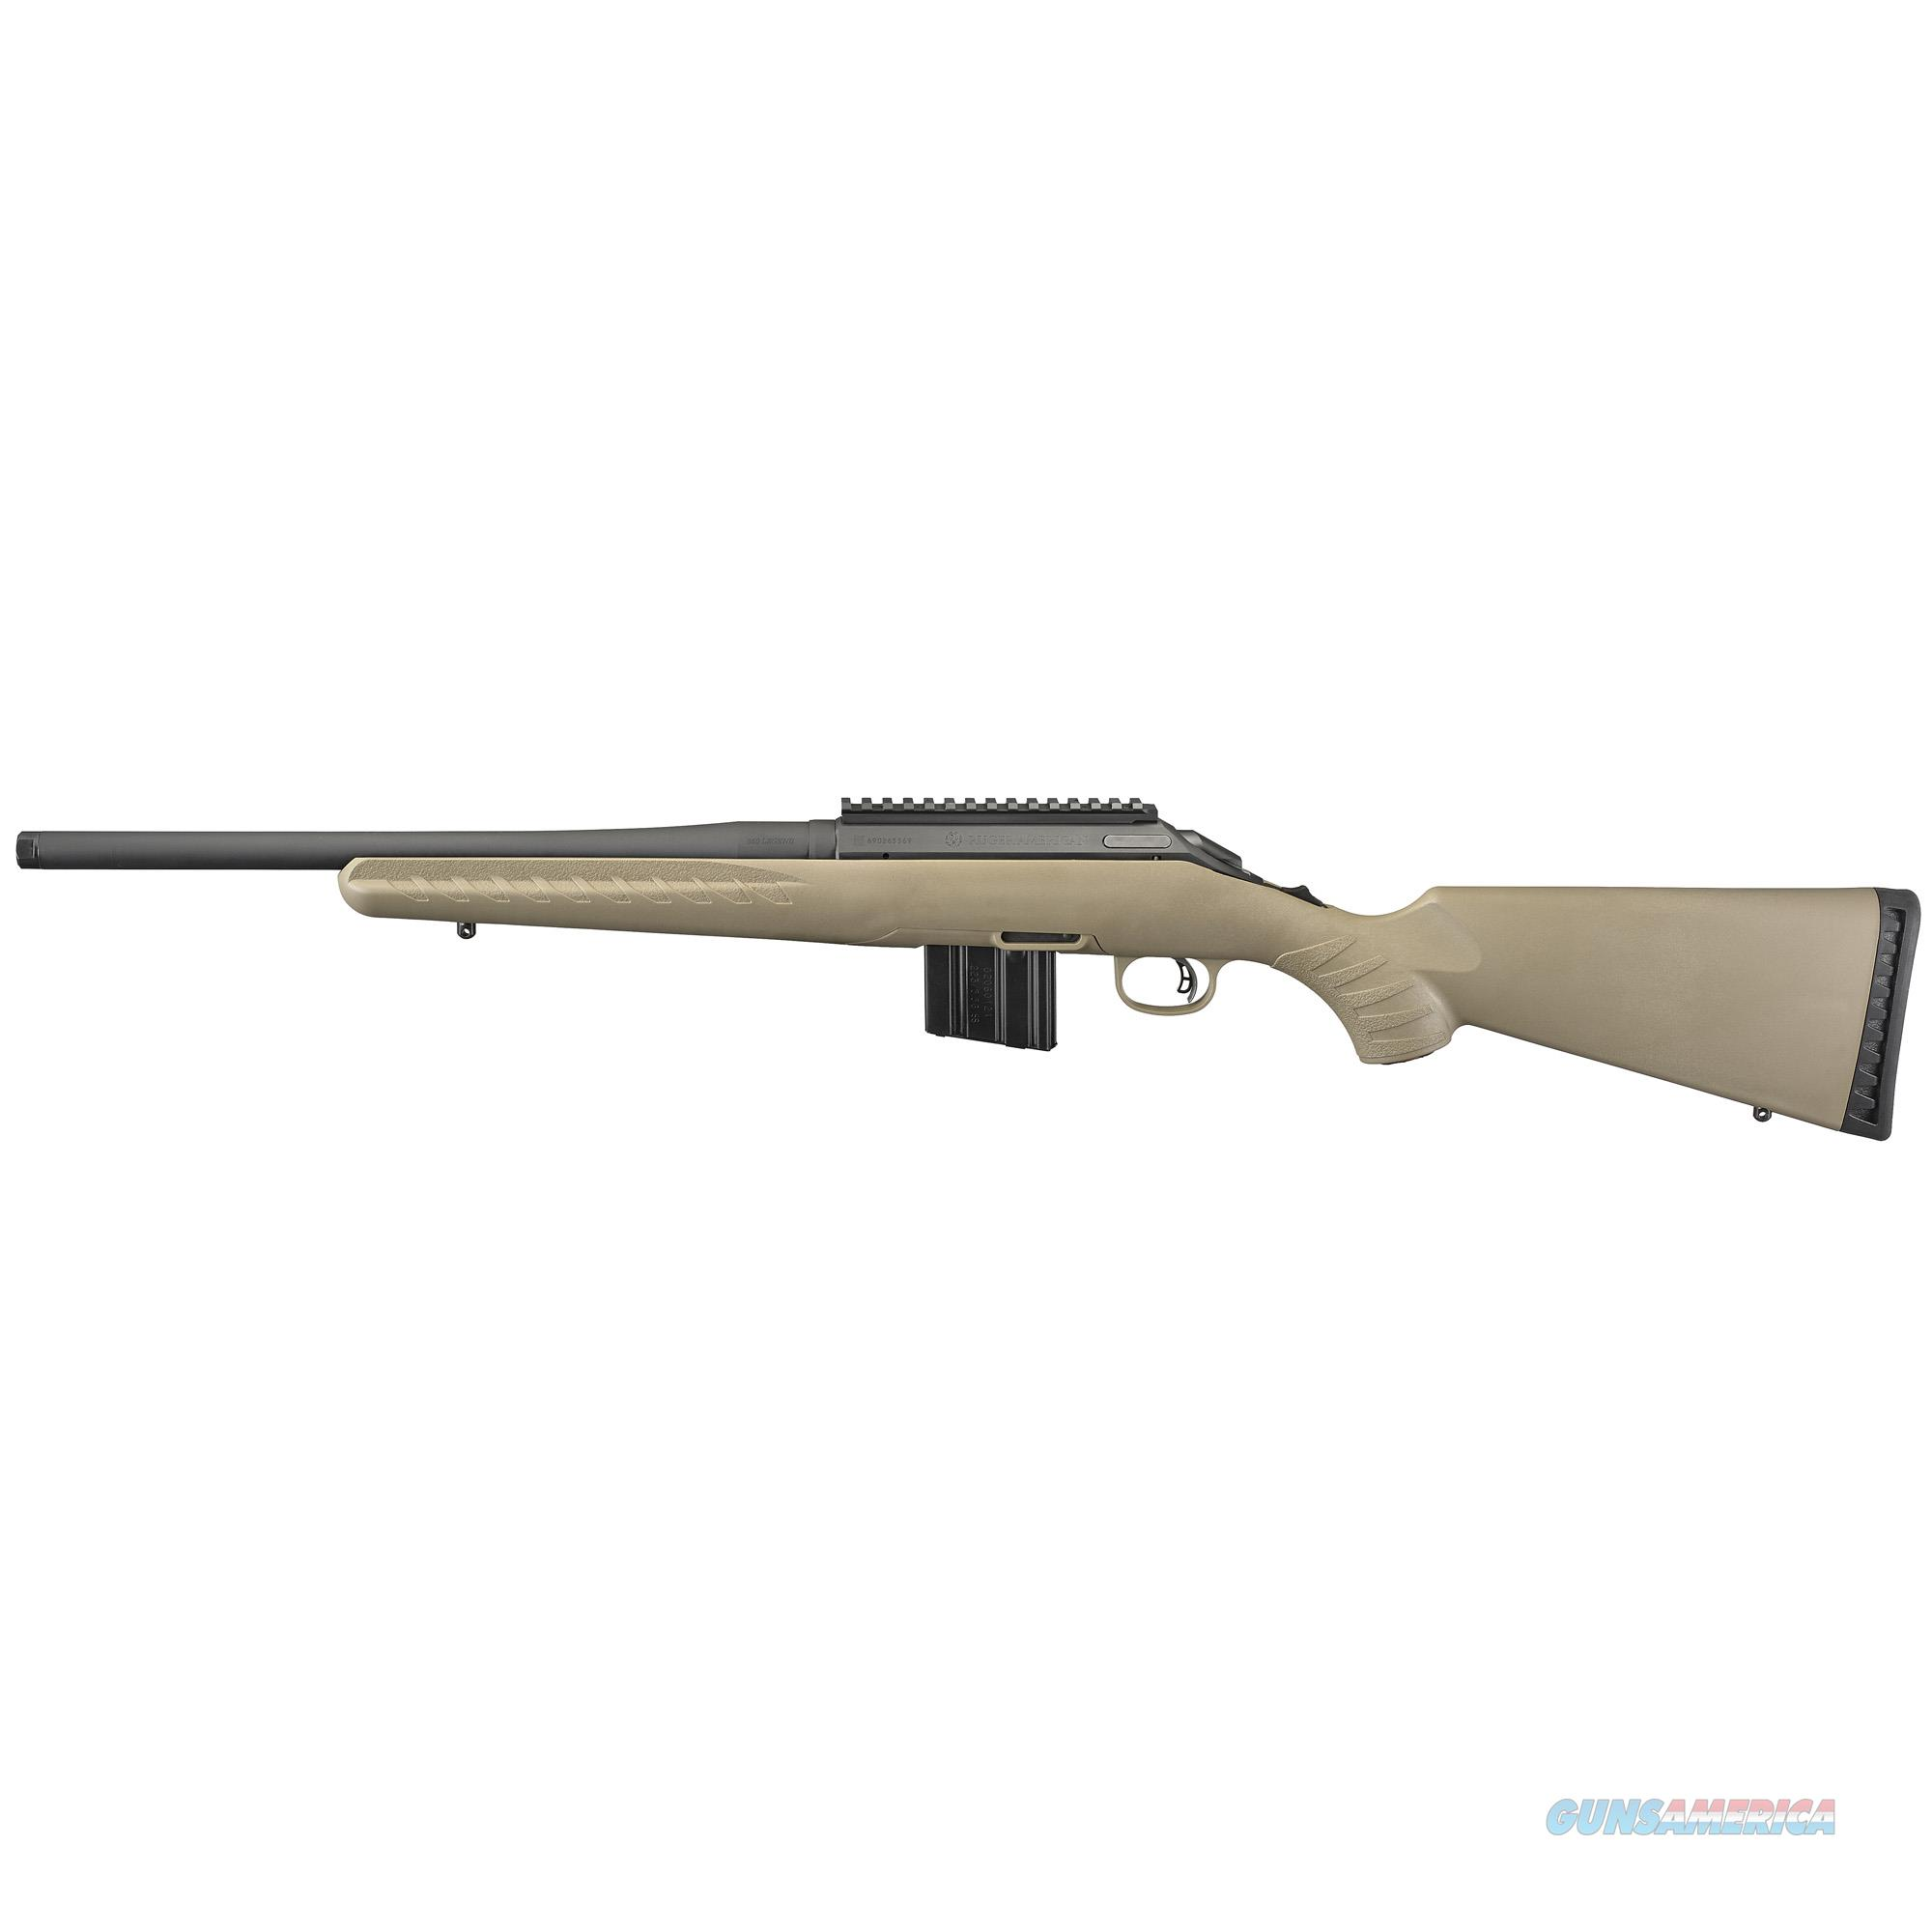 Ruger American Ranch, Rug 26981 Amer Rnch 350 Legend       Fde-blk  Guns > Pistols > 1911 Pistol Copies (non-Colt)